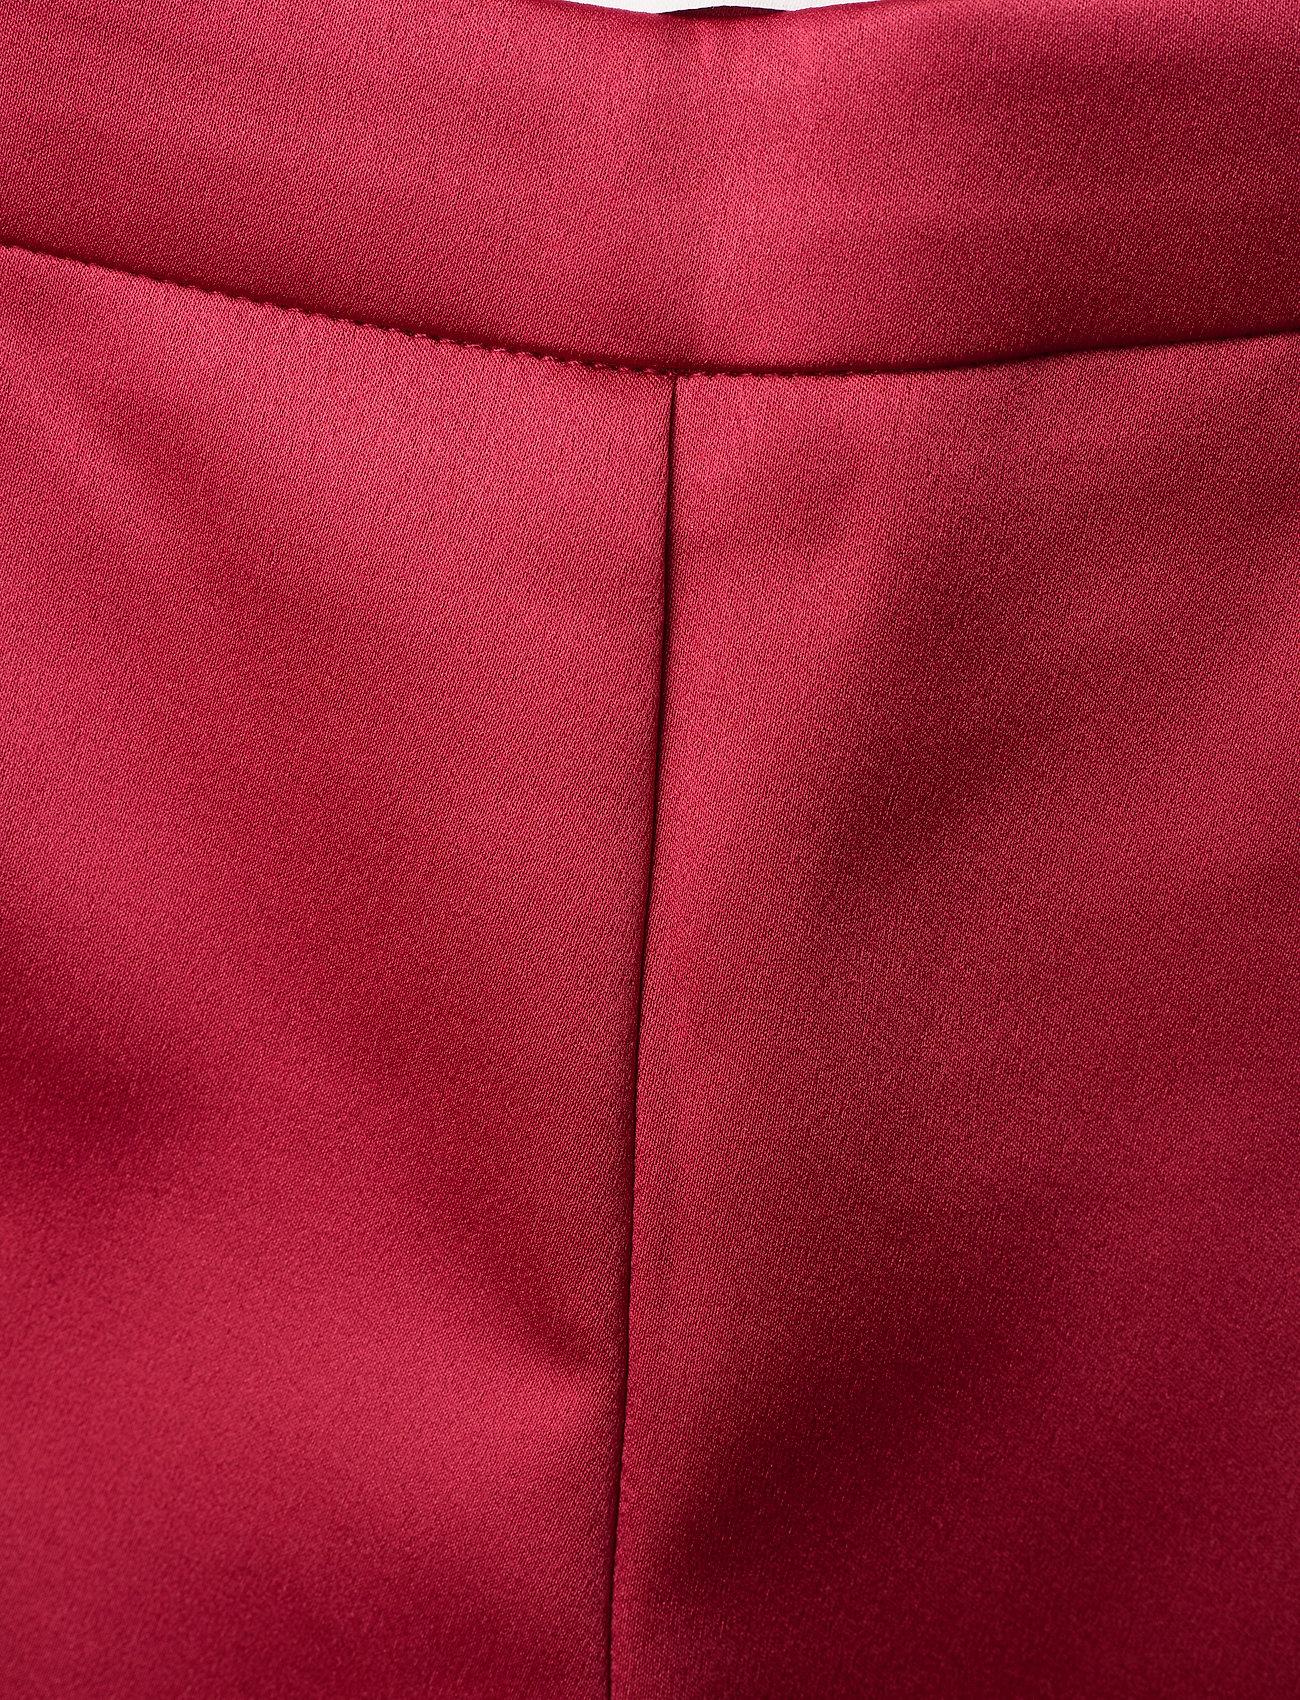 Farica Trousers  - Aéryne